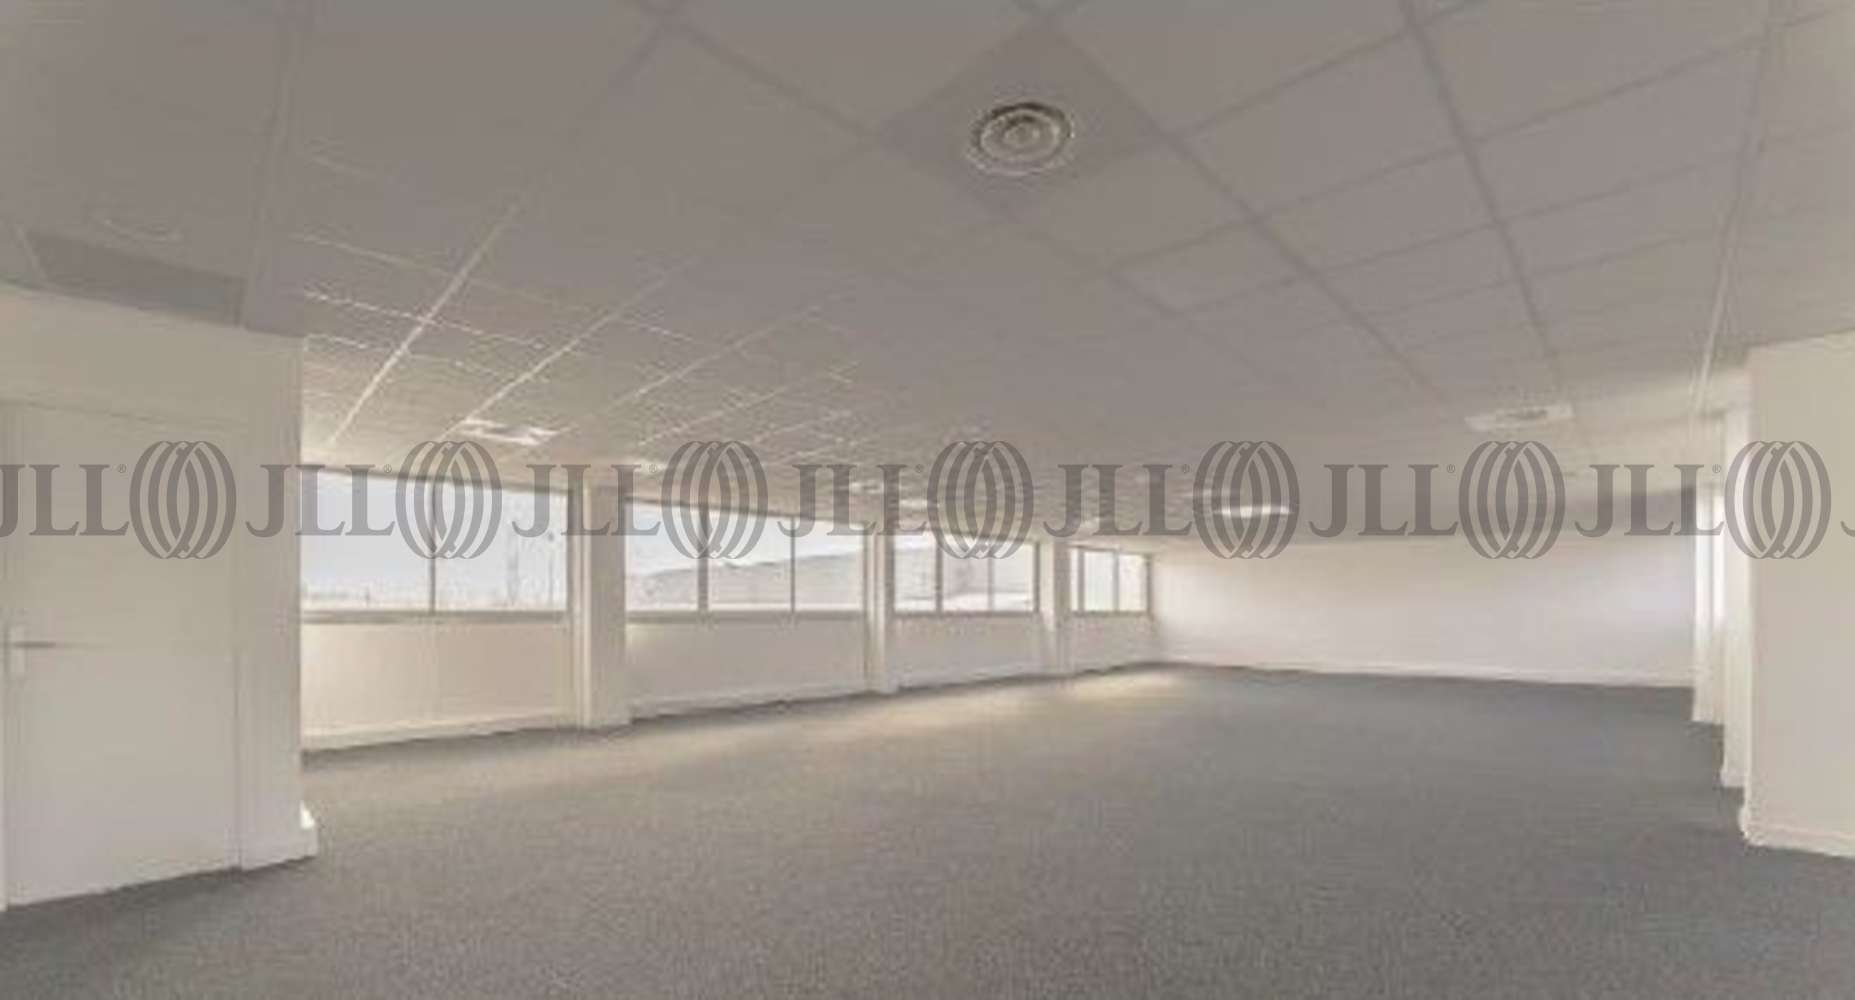 Activités/entrepôt Fresnes, 94260 - 8-10 RUE DE CHEVILLY